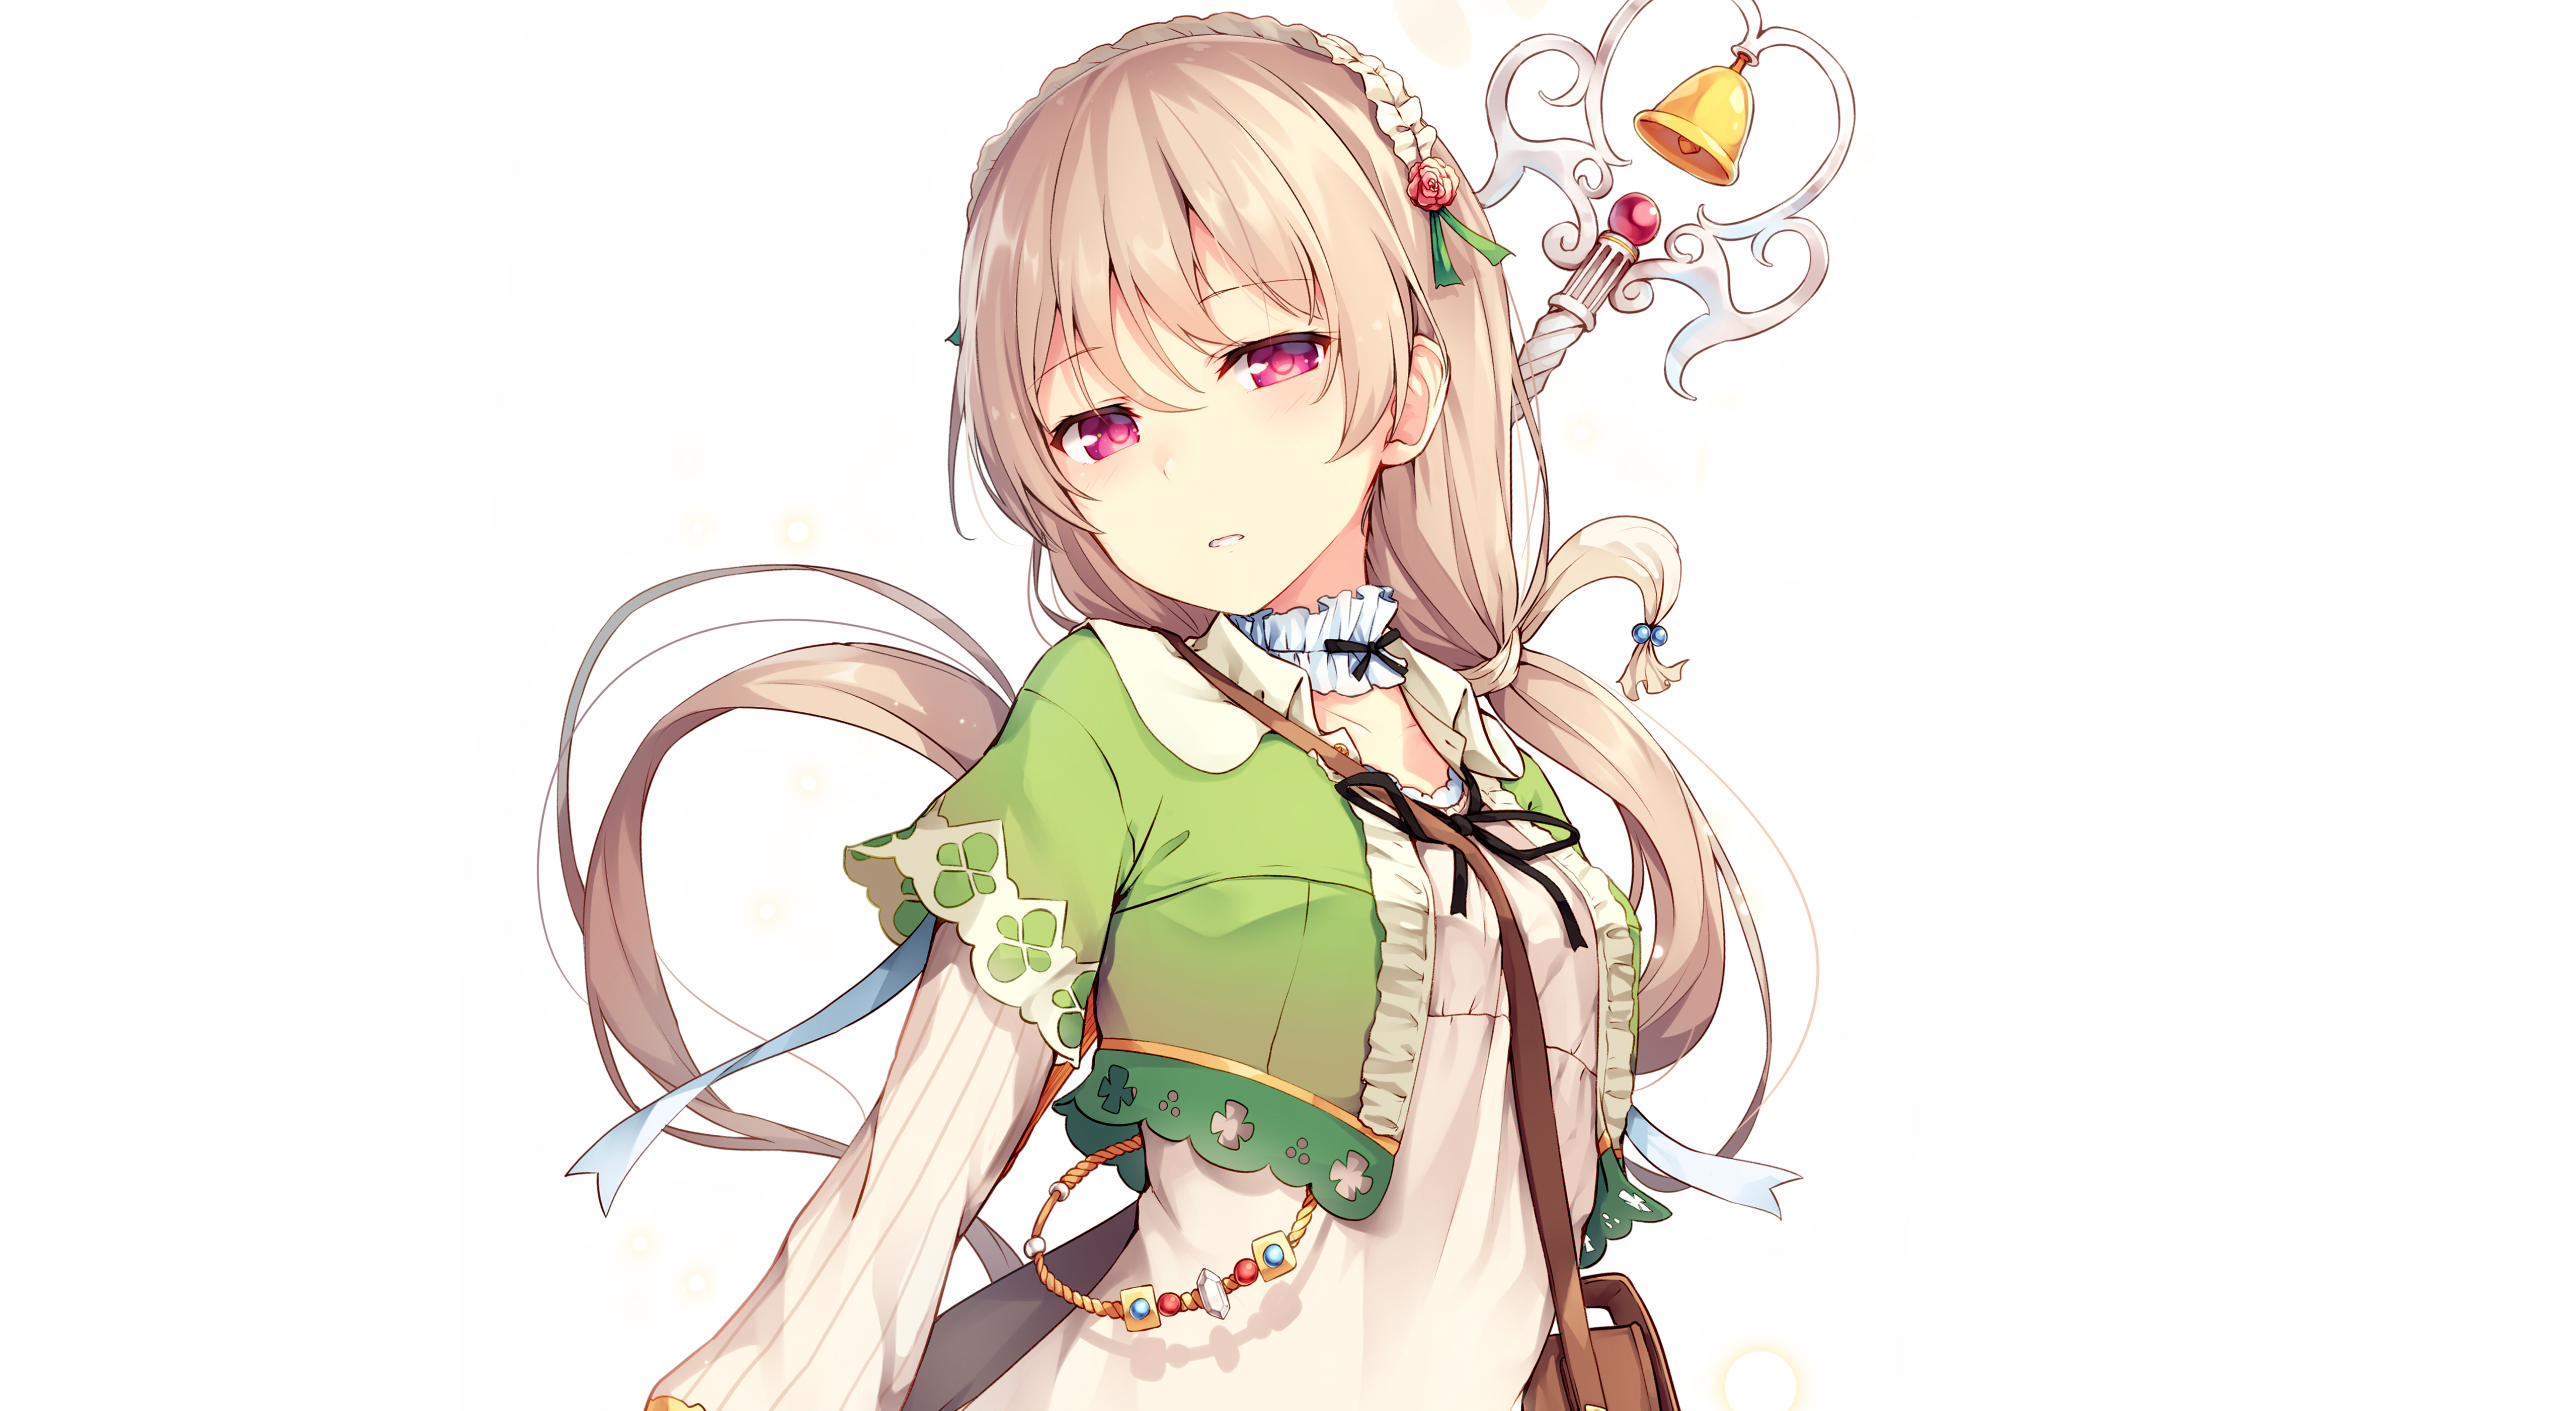 Anime Girl 4k Ultra Hd Wallpaper Background Image 5120x2805